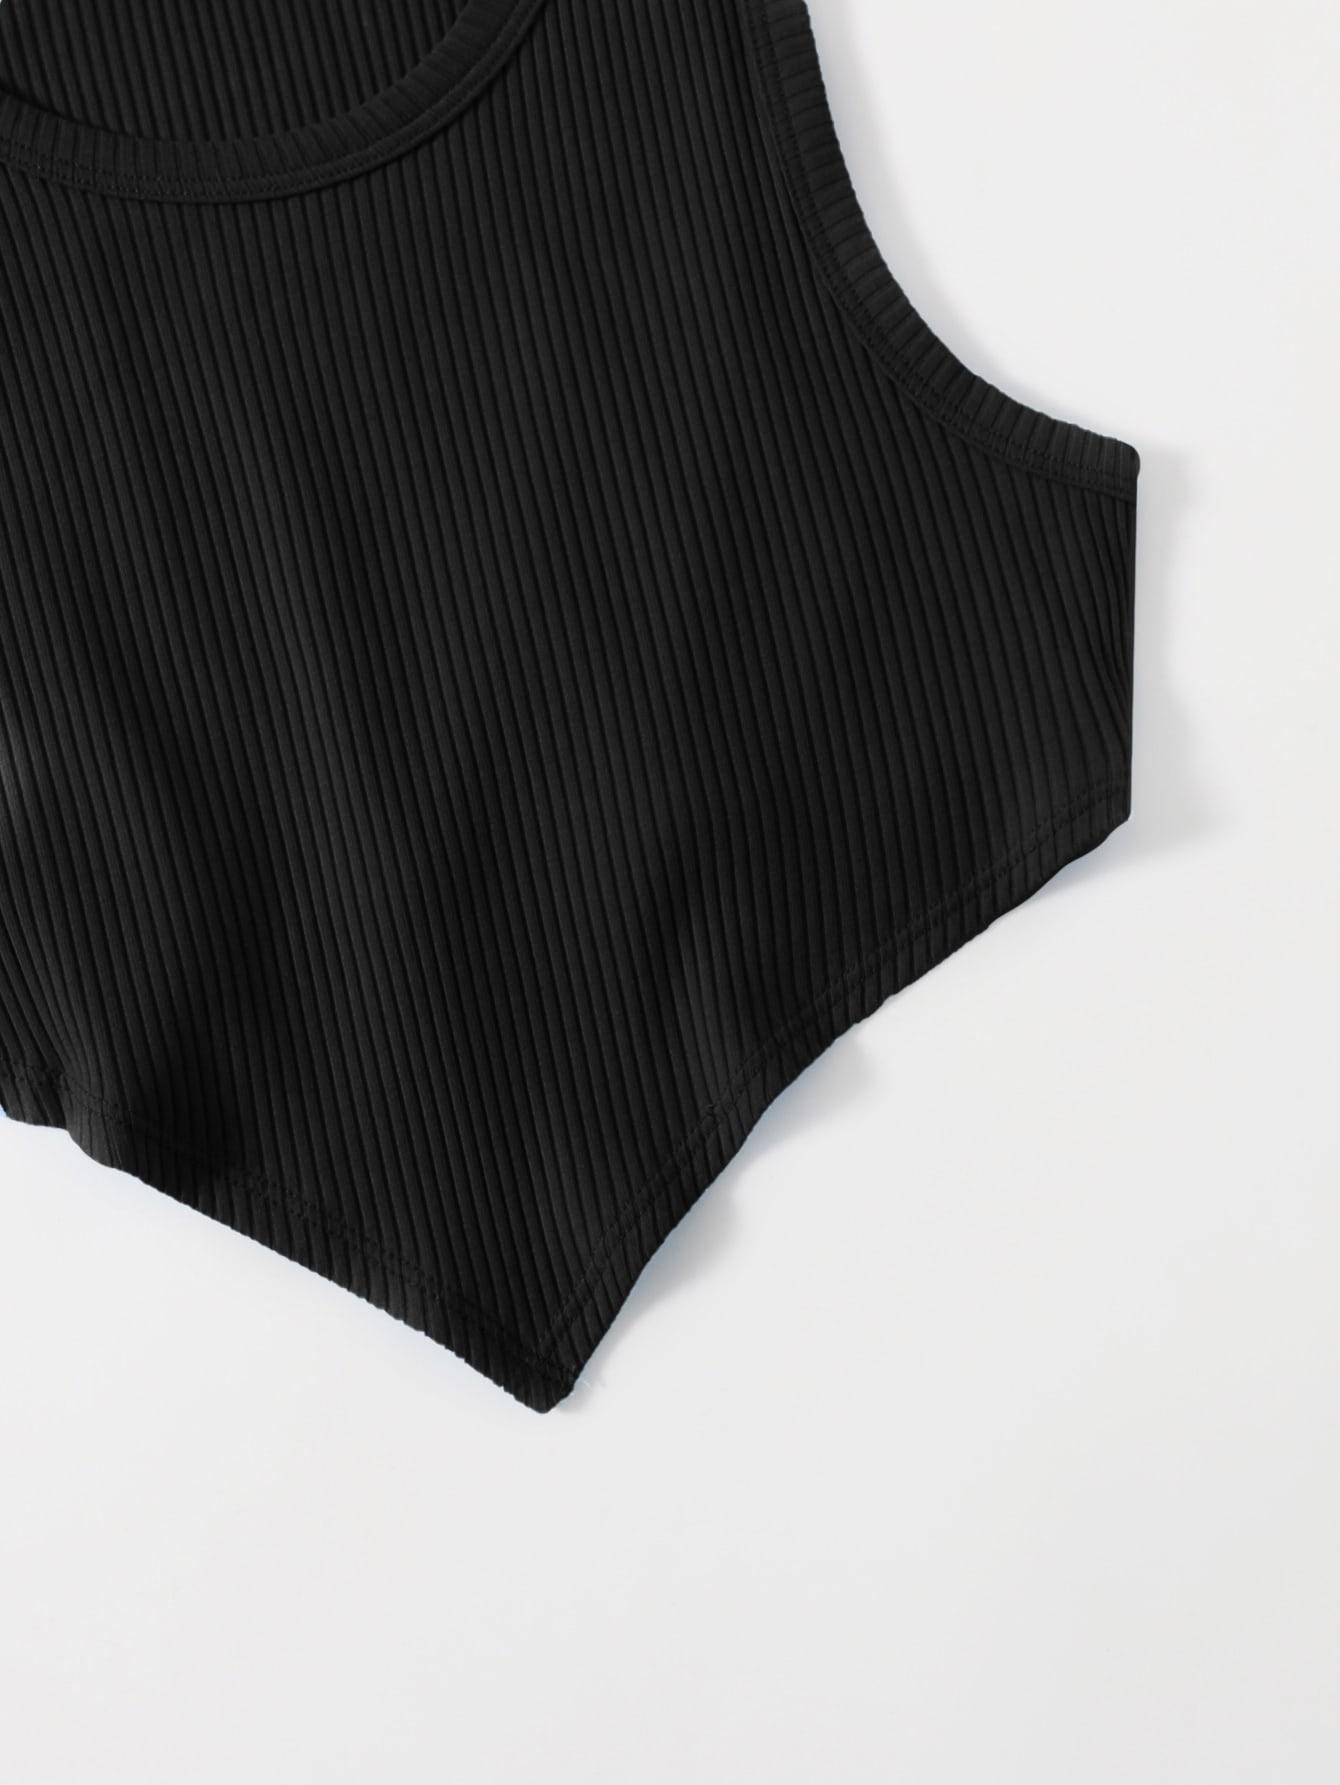 Asymmetrical Hem Rib-knit Crop Tank Top